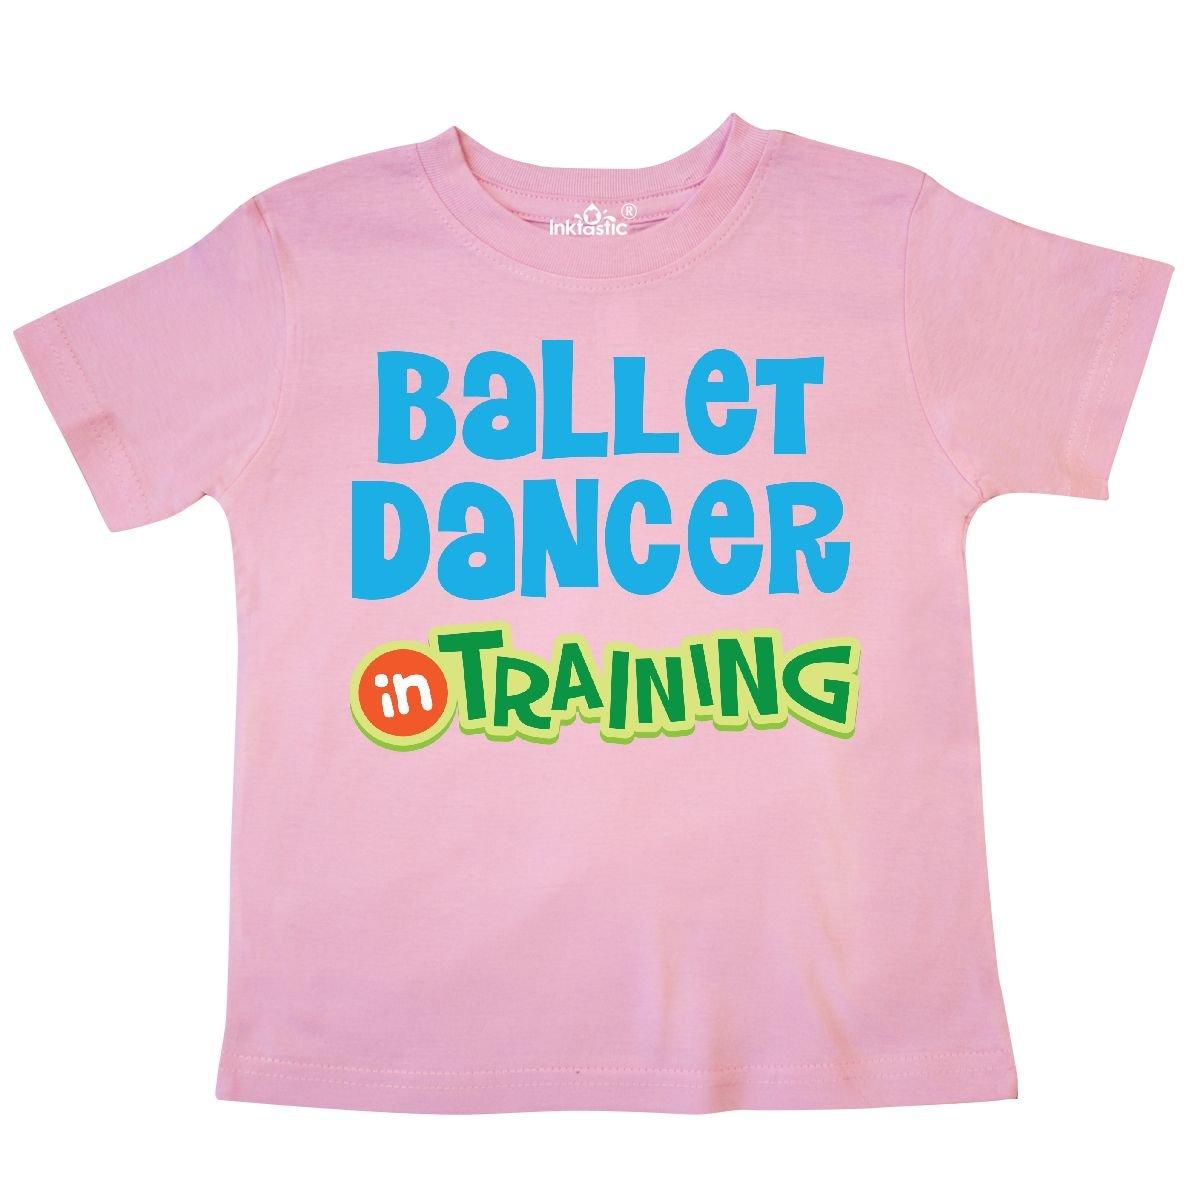 inktastic Ballet Dancer in Training Dance Toddler T-Shirt